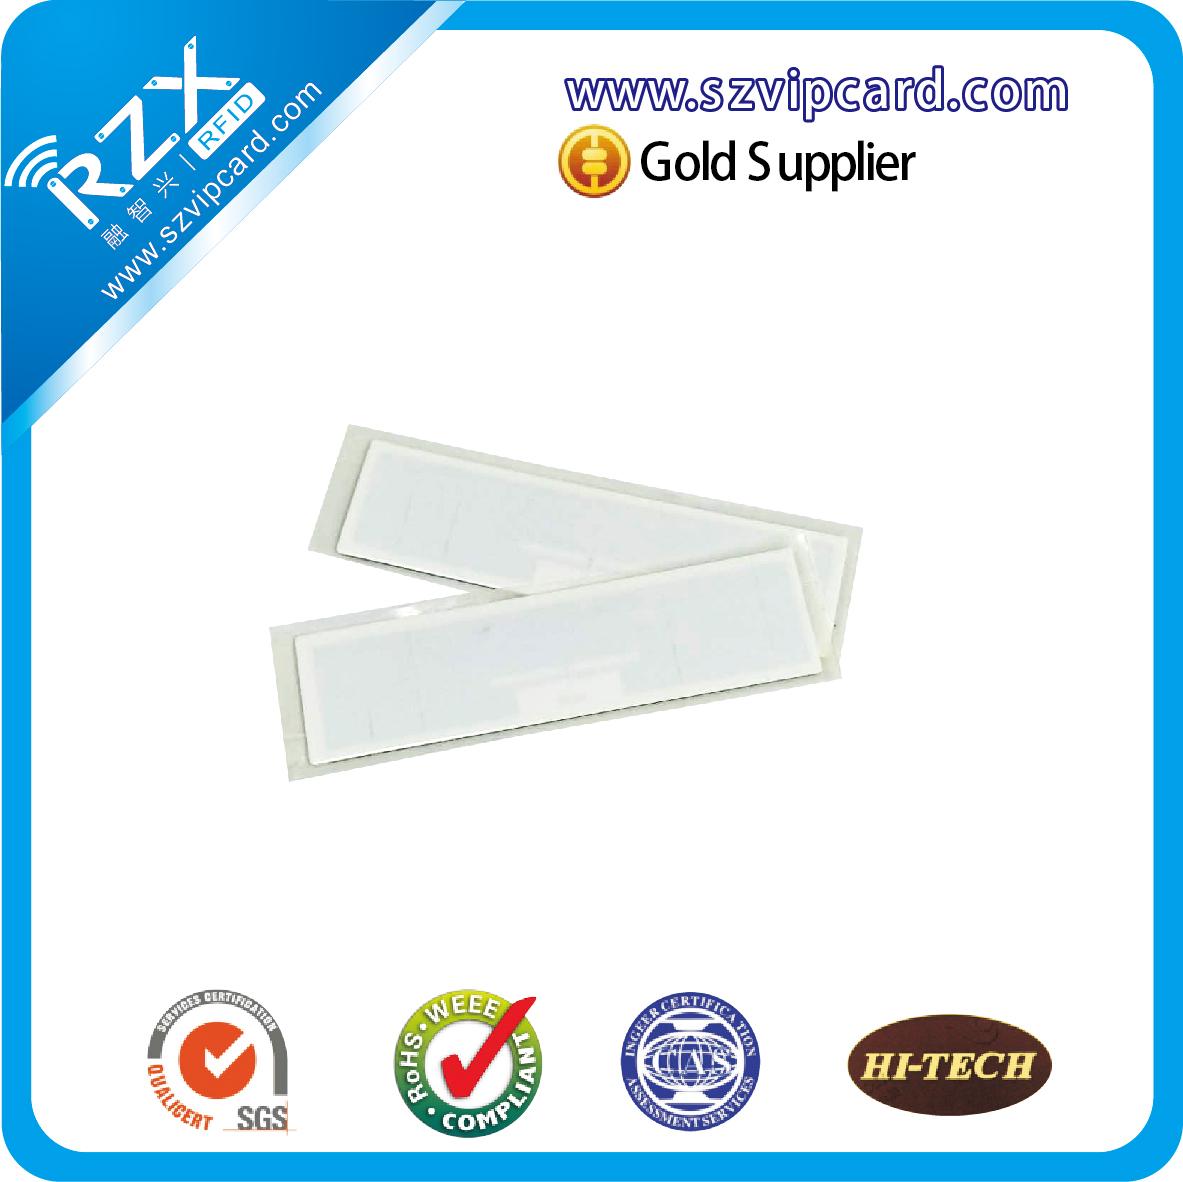 RZX-UG02 可打印抗金属标签